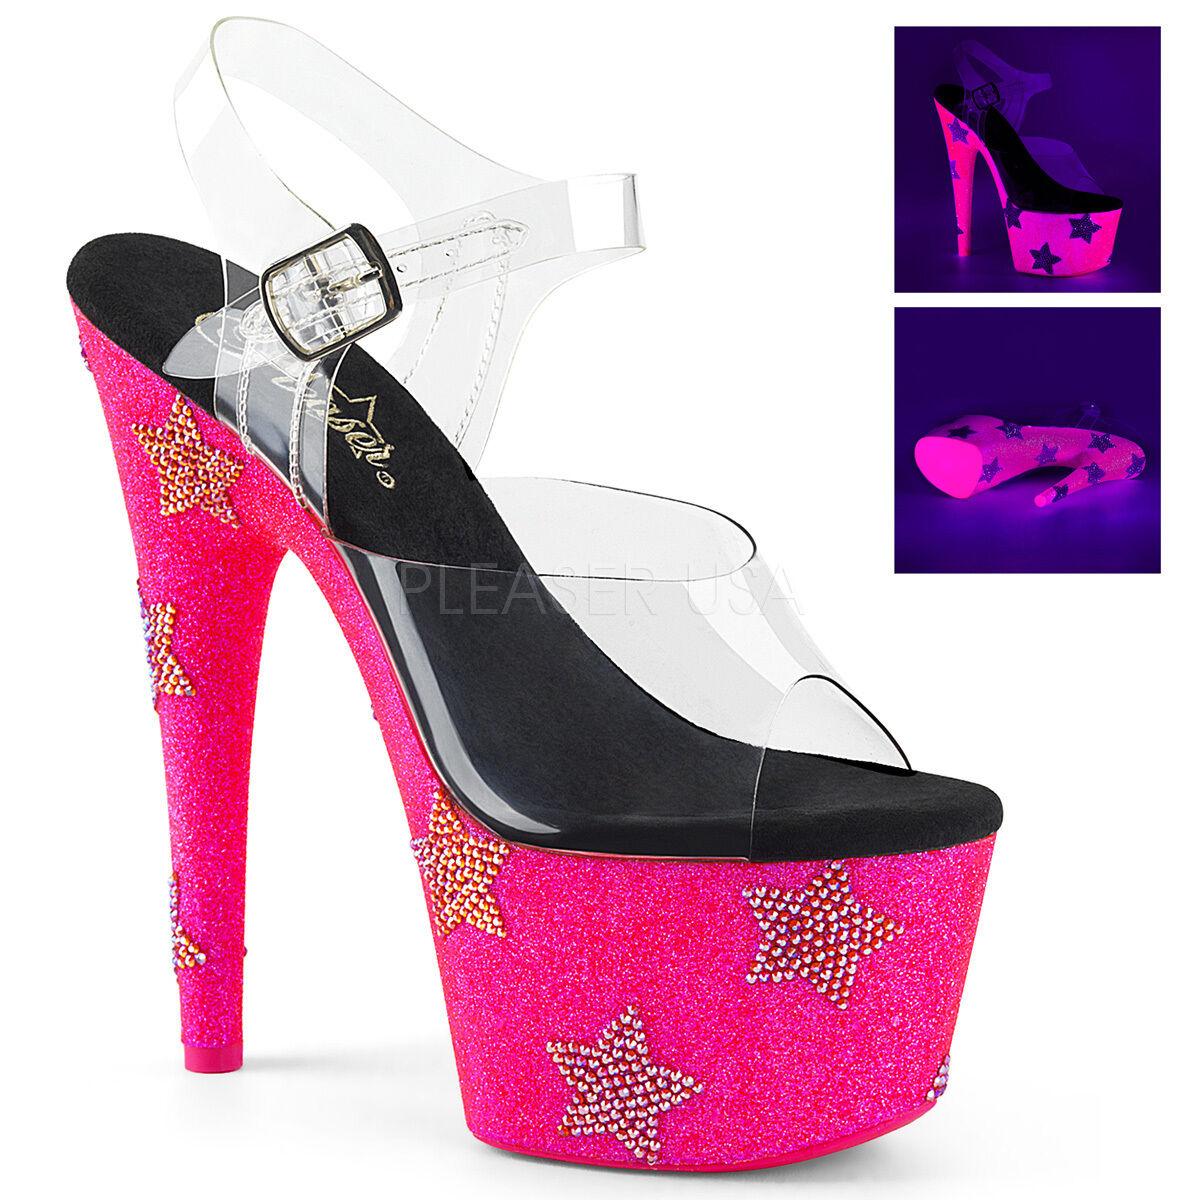 PLEASER 7  Heel Pink Glitter Platform Rhinestone Stars Ankle Strap Women shoes